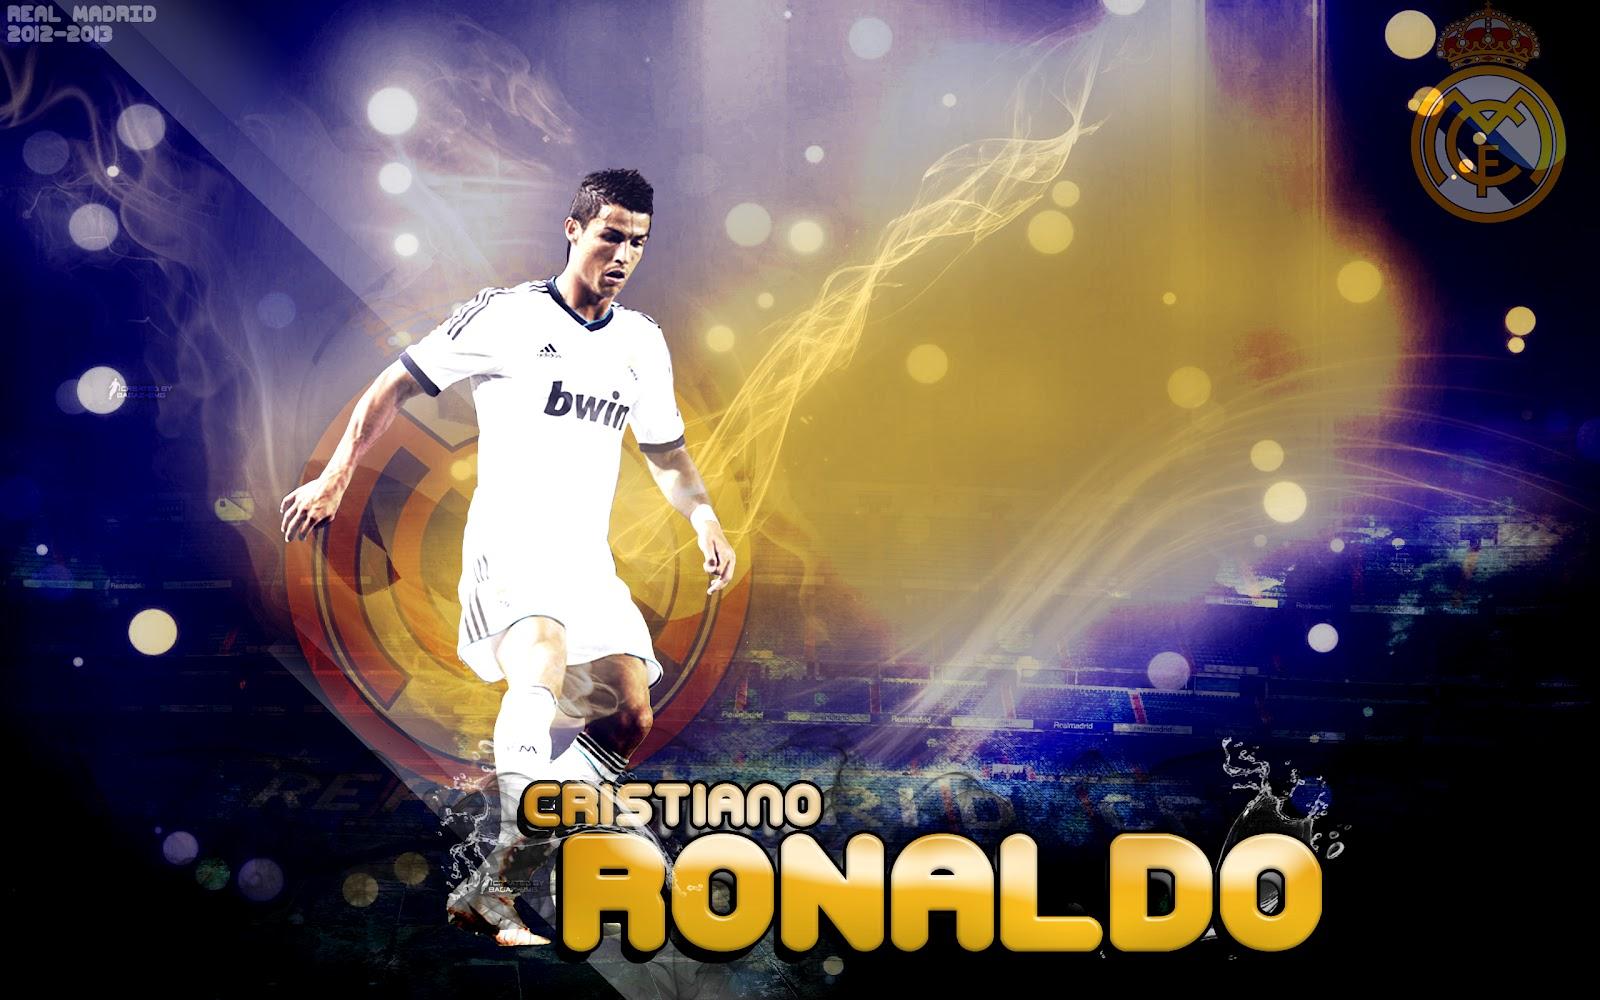 http://3.bp.blogspot.com/-P6YYE11gMag/UOrVyRq3_RI/AAAAAAAAQo8/XB68ORJmfh8/s1600/Cristiano+Ronaldo+Real+Madrid+wallpaper+2012-2013+04.jpg